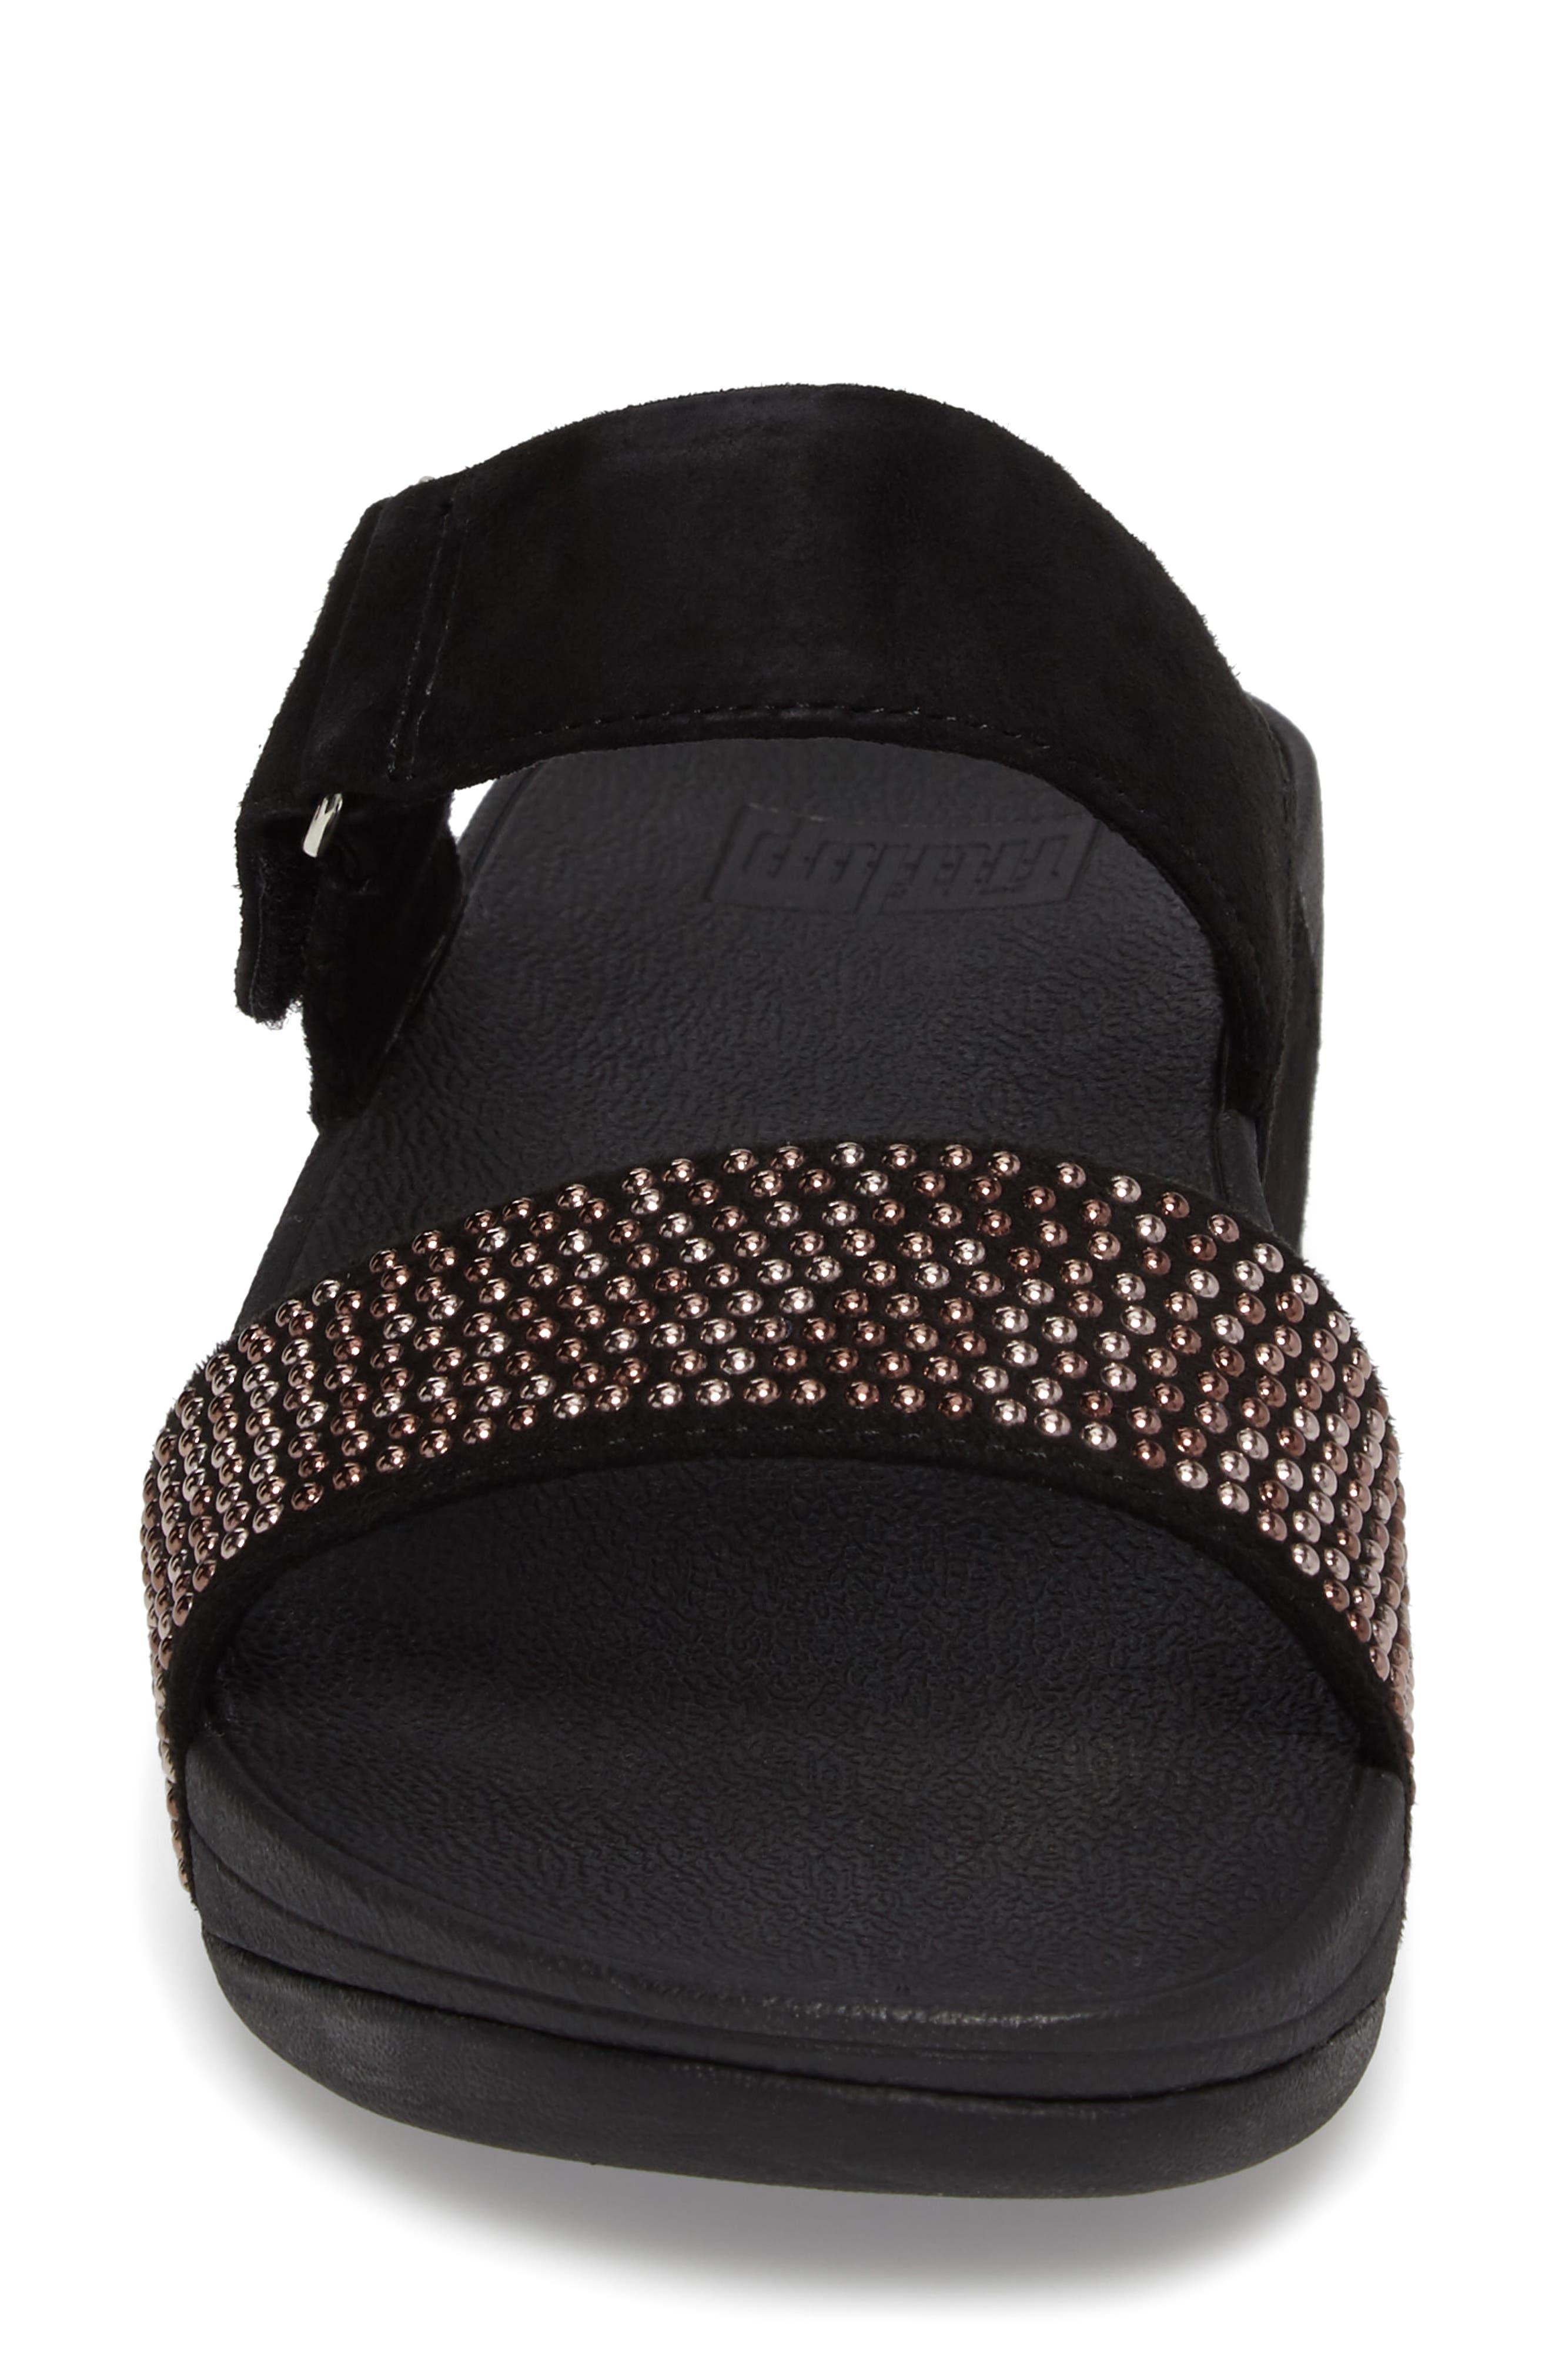 Lulu Popstud Wedge Slide Sandal,                             Alternate thumbnail 4, color,                             Black Fabric